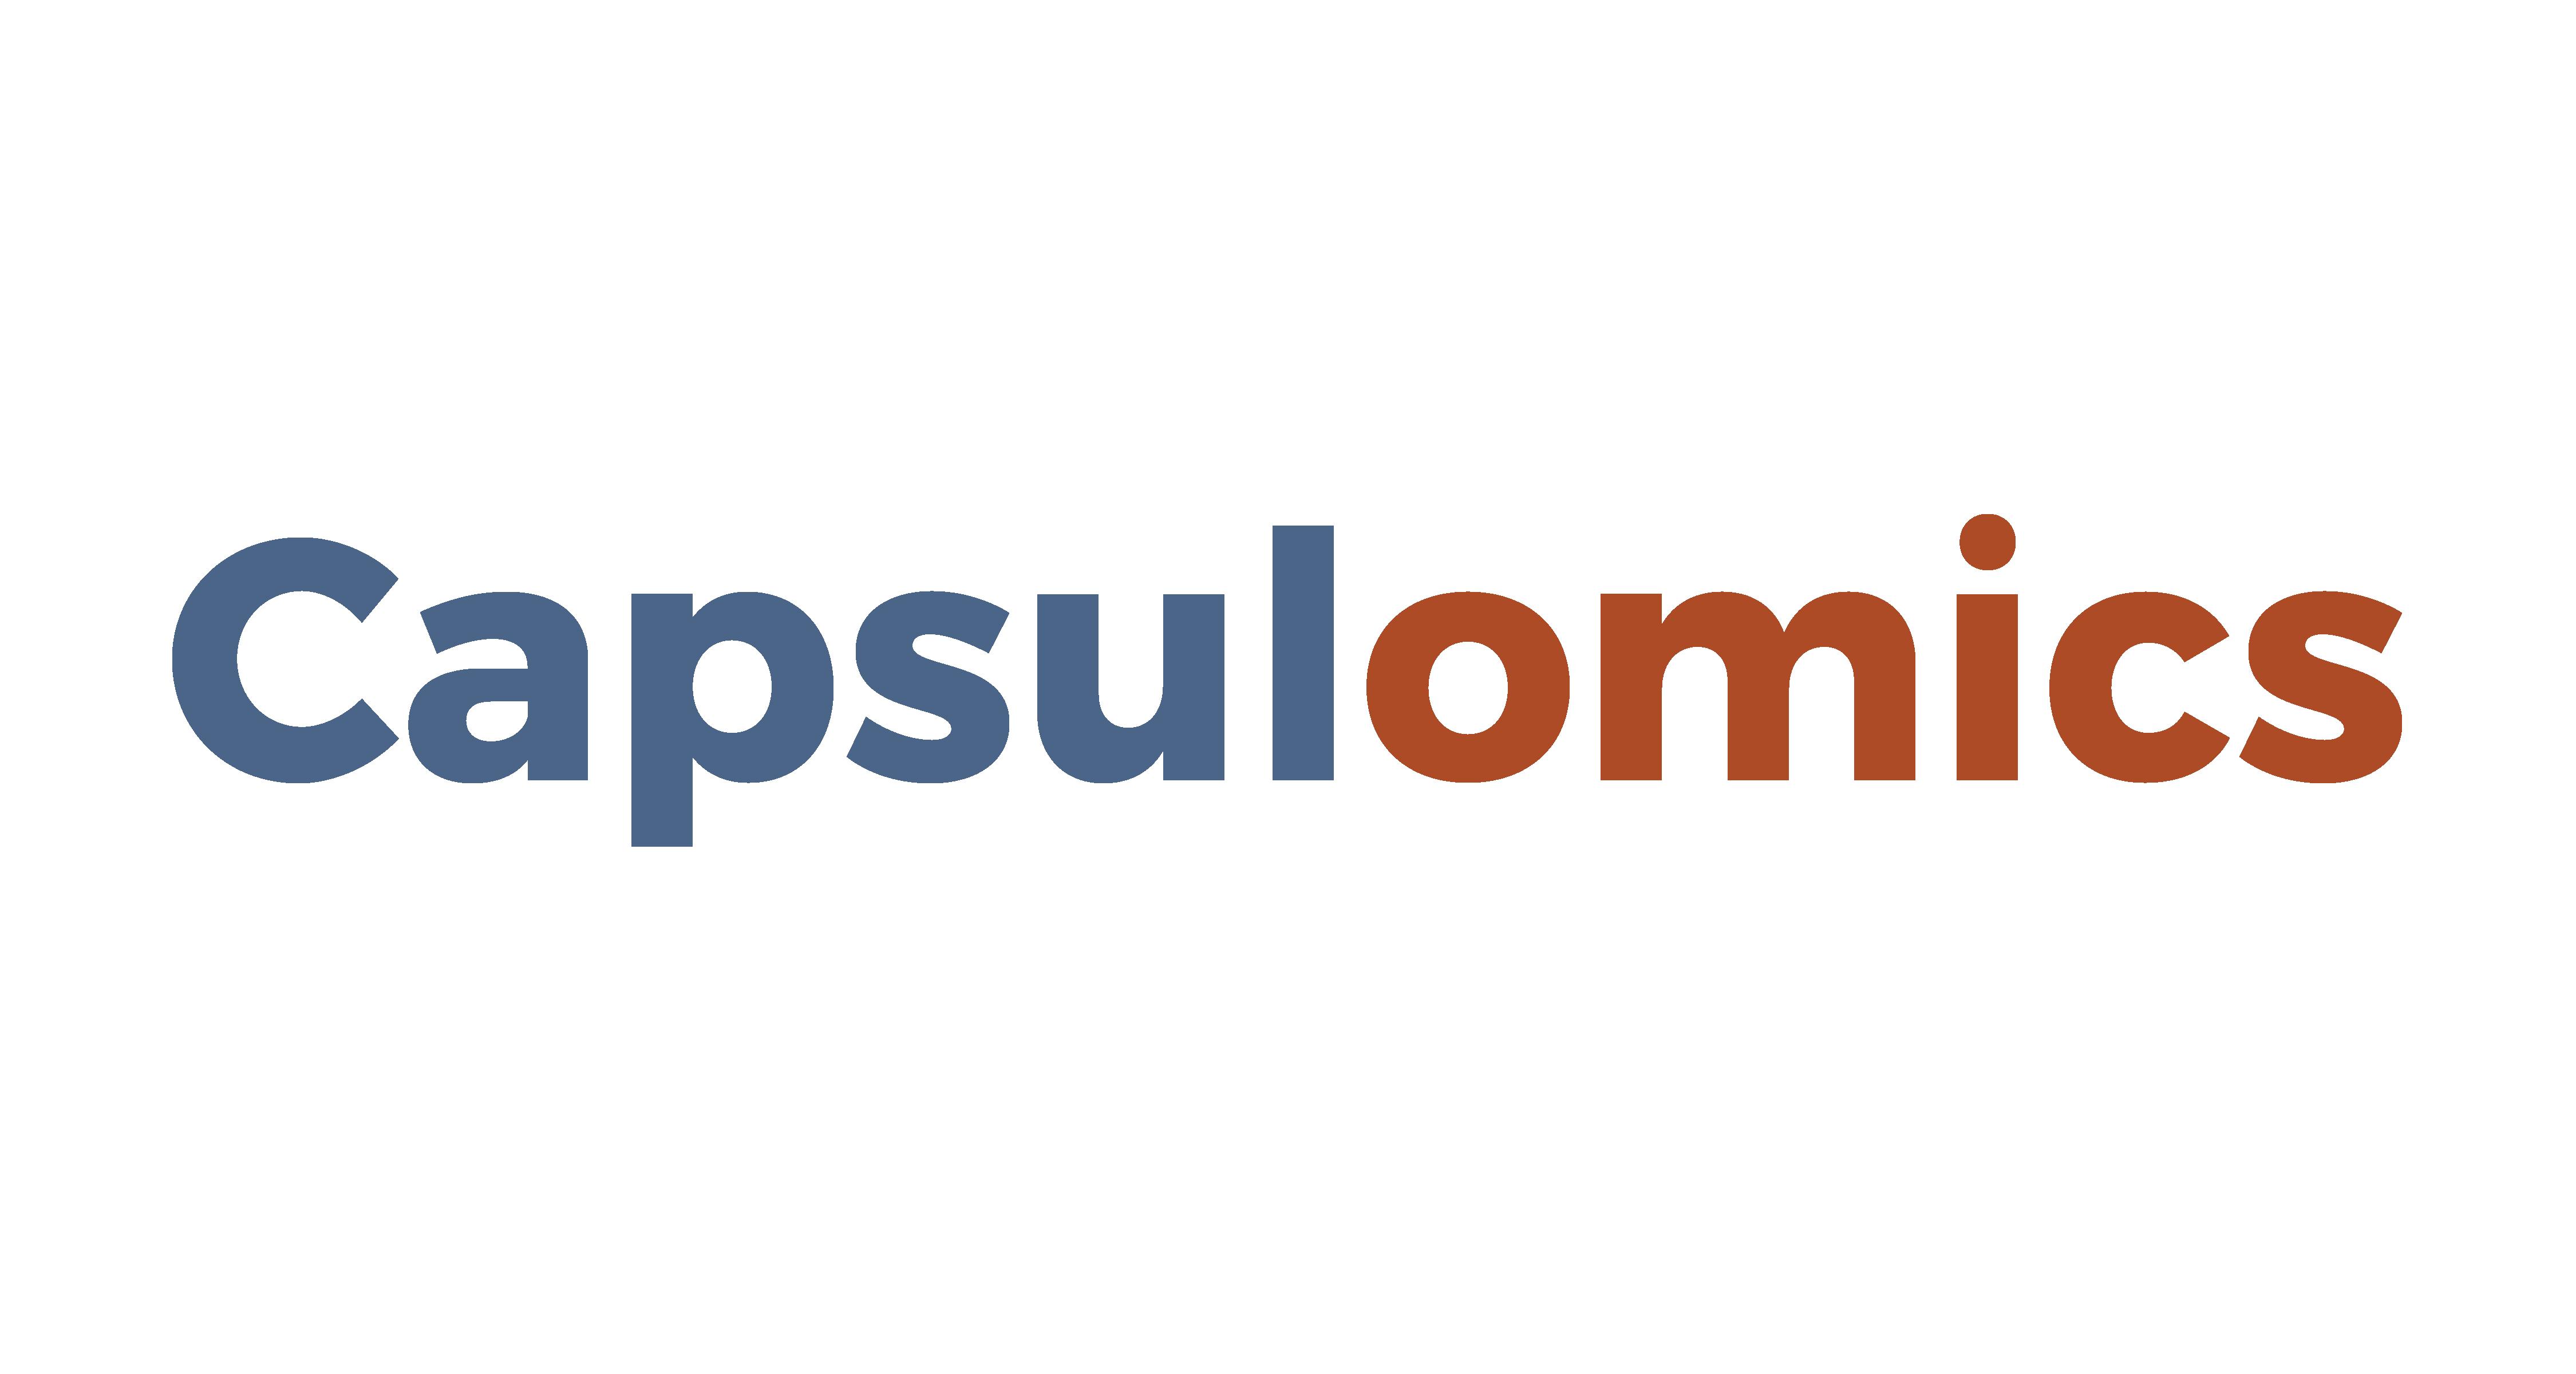 Capsulomics